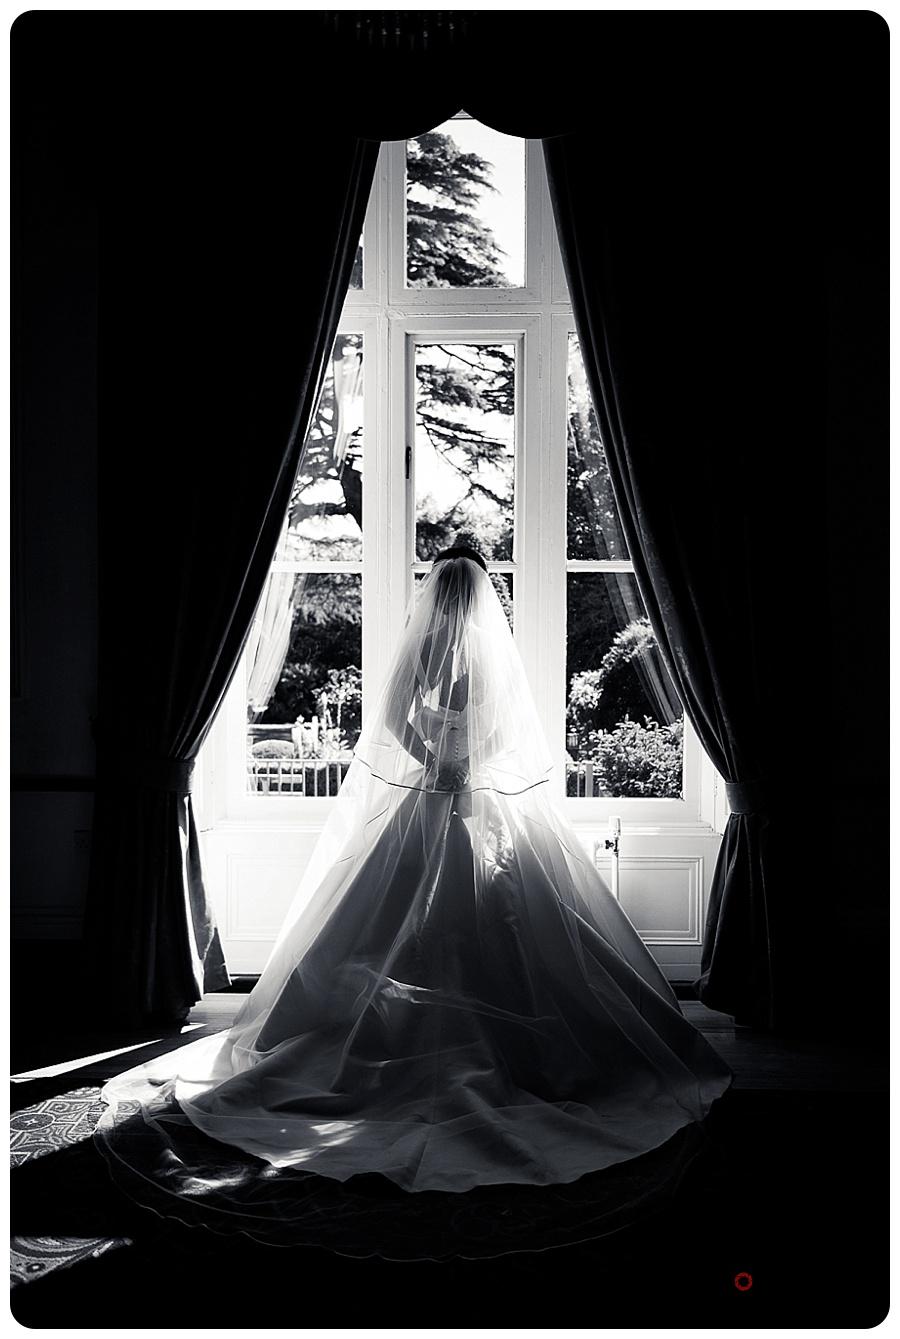 Maeve & Thomas's wedding at the Ballymascanlon Hotel by Ciaran O'Neill Photography